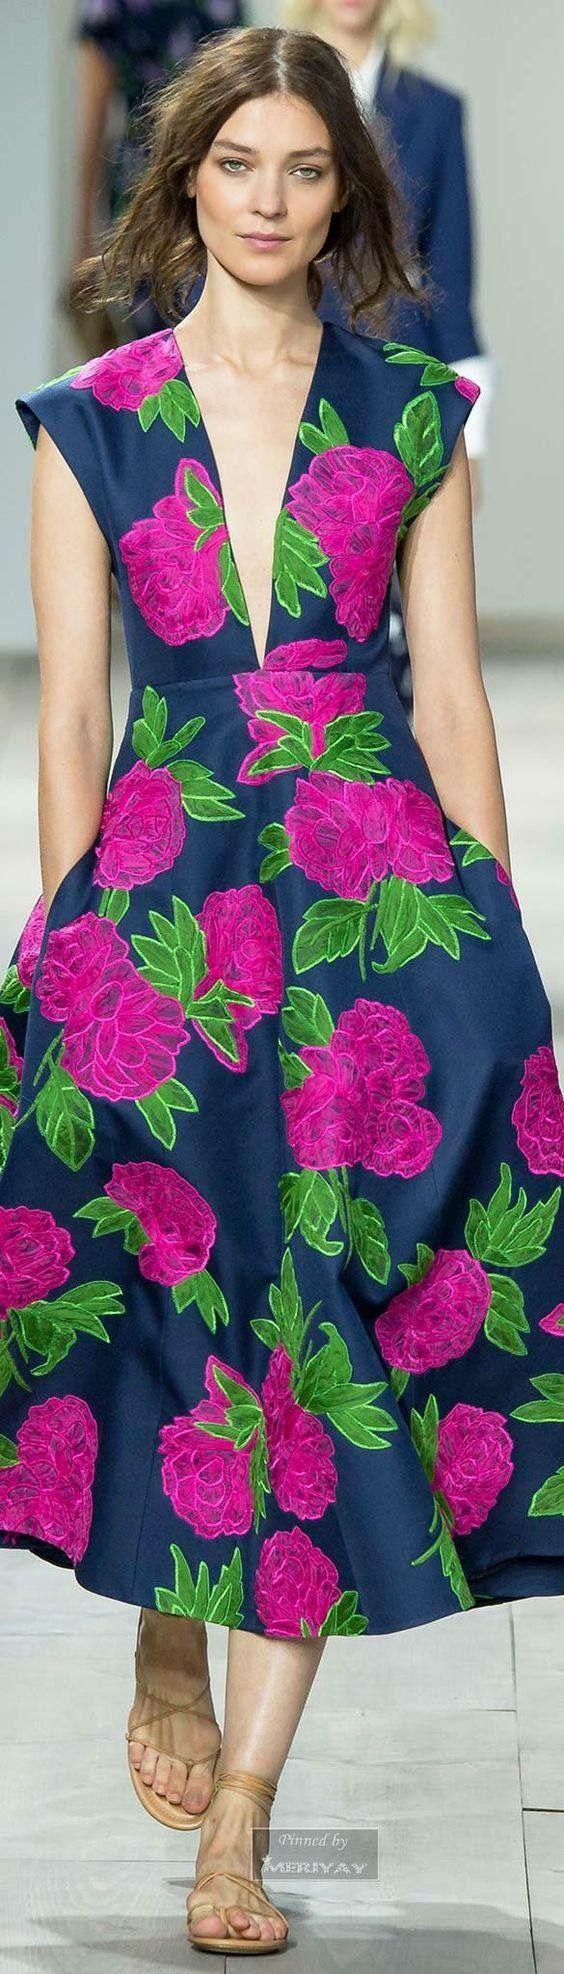 Vestido flores manga corrida escote profundo en V